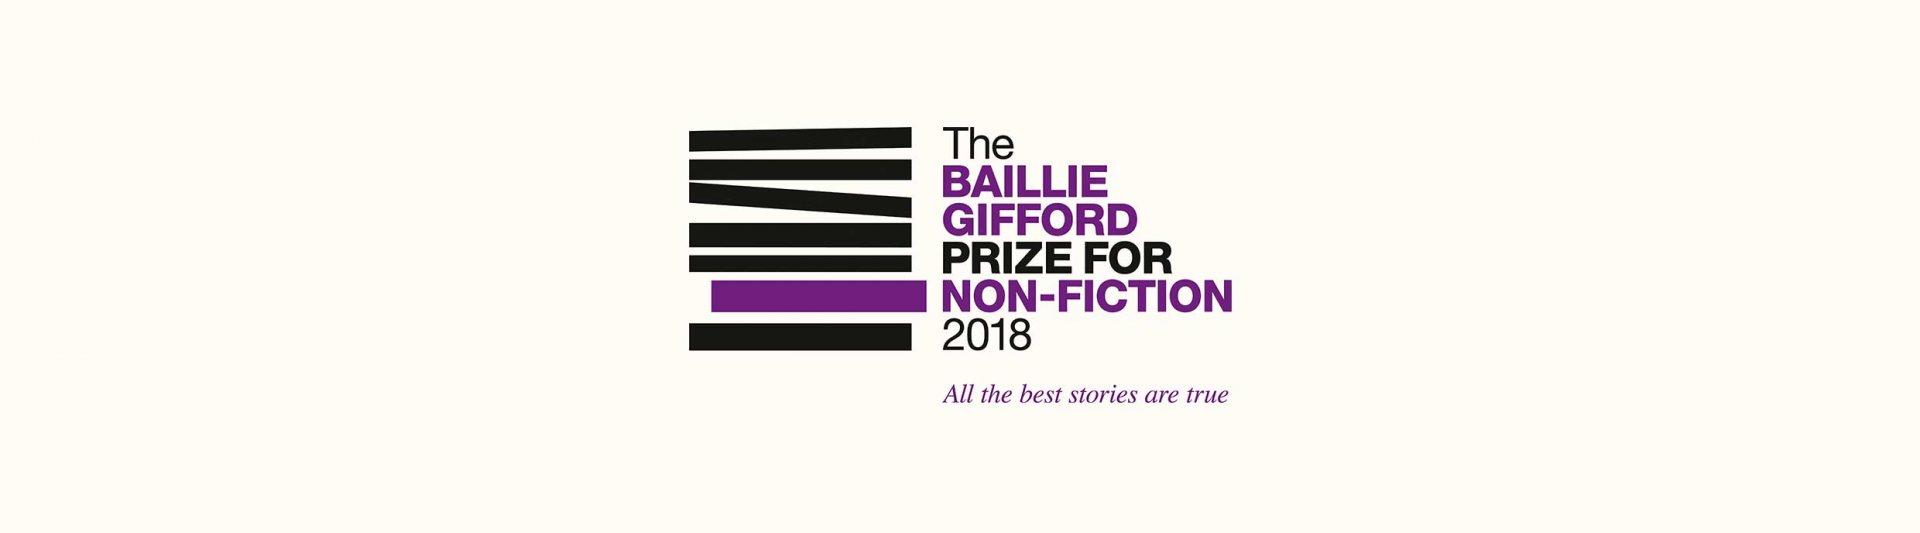 Baillie Gifford Book Award 2018